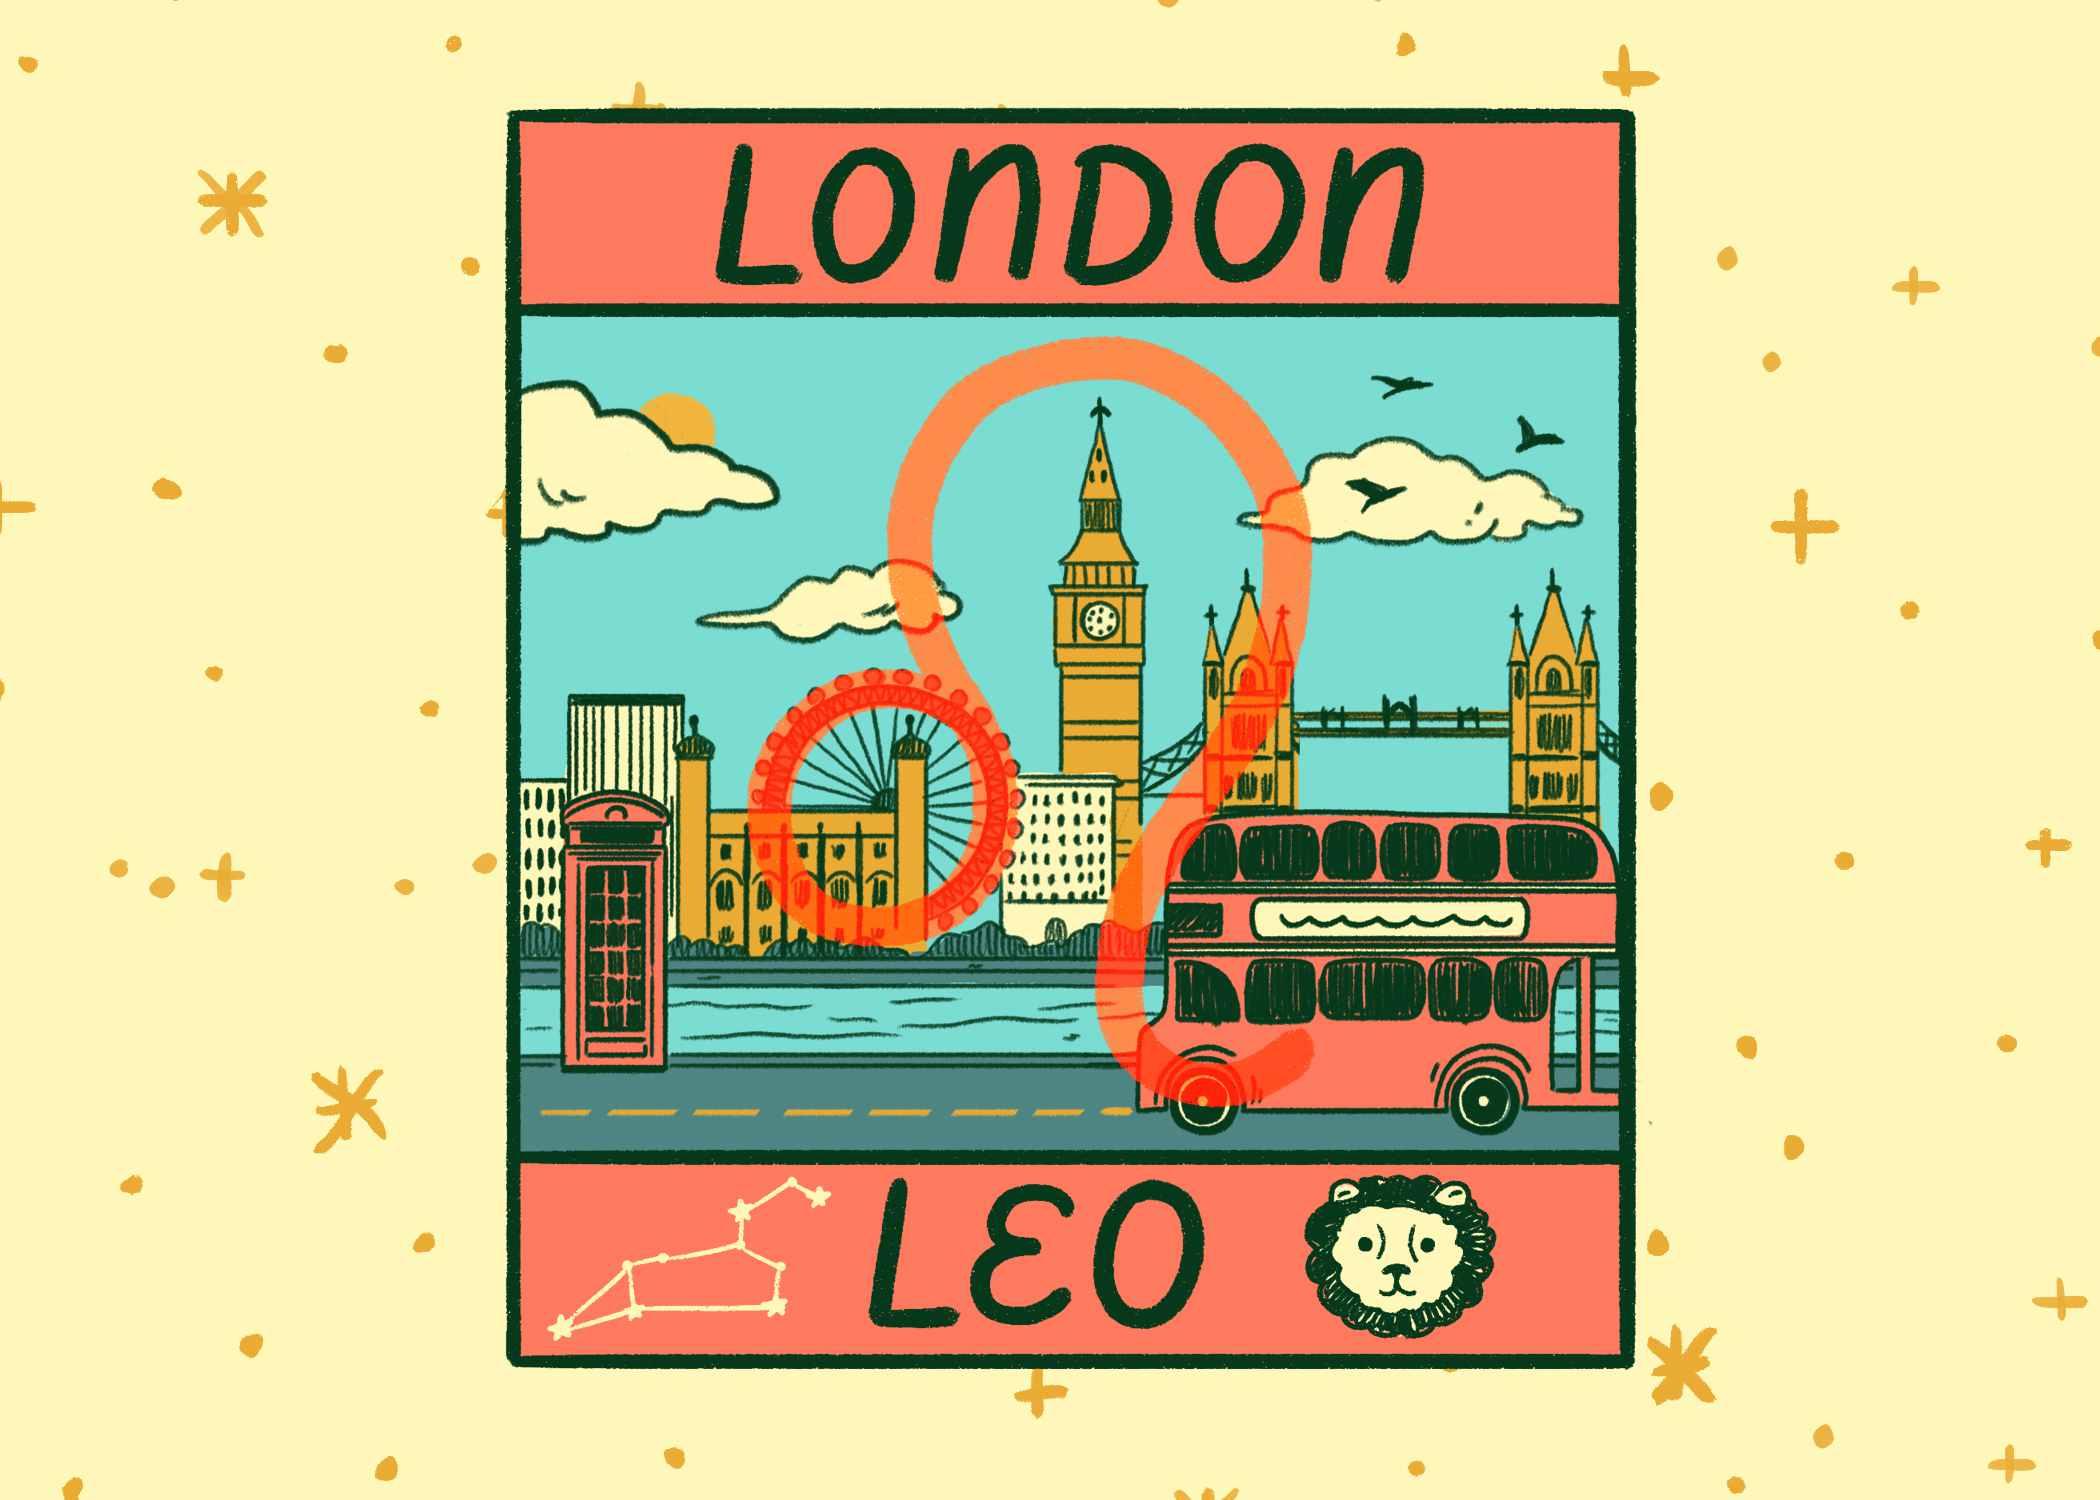 Illustration of London and Leo